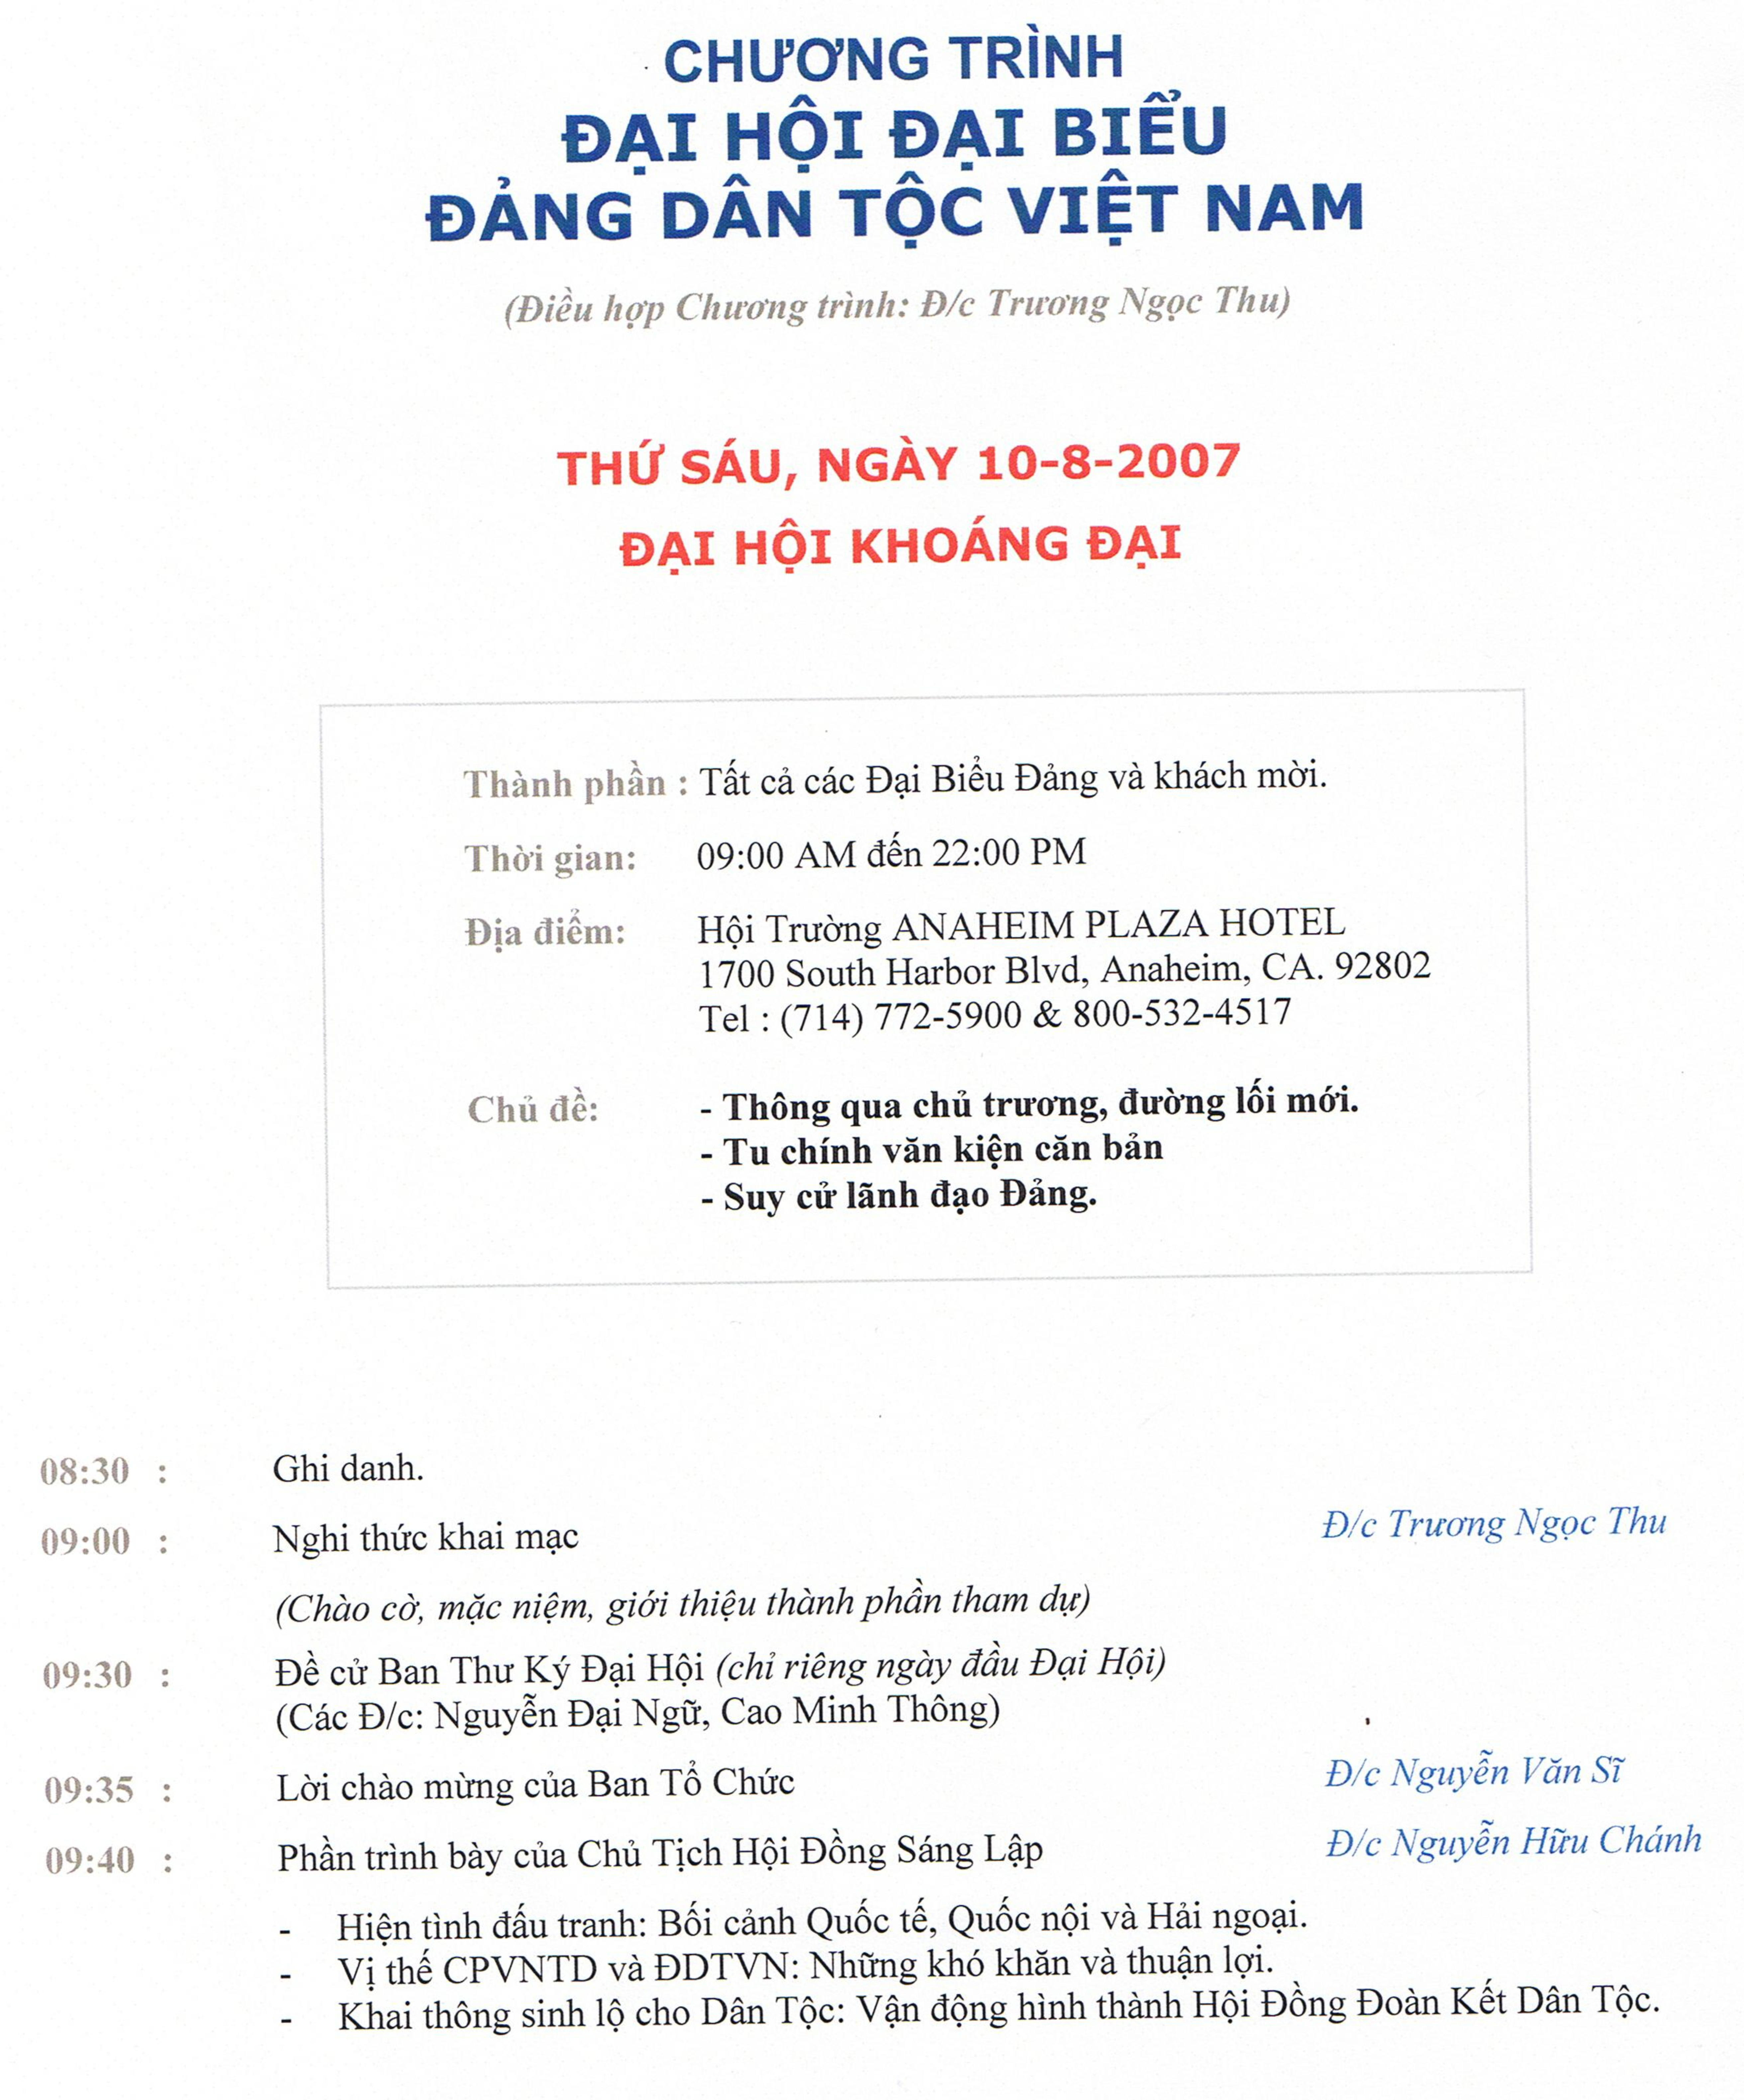 Chuong Trinh 10-11-12 thang 08-07